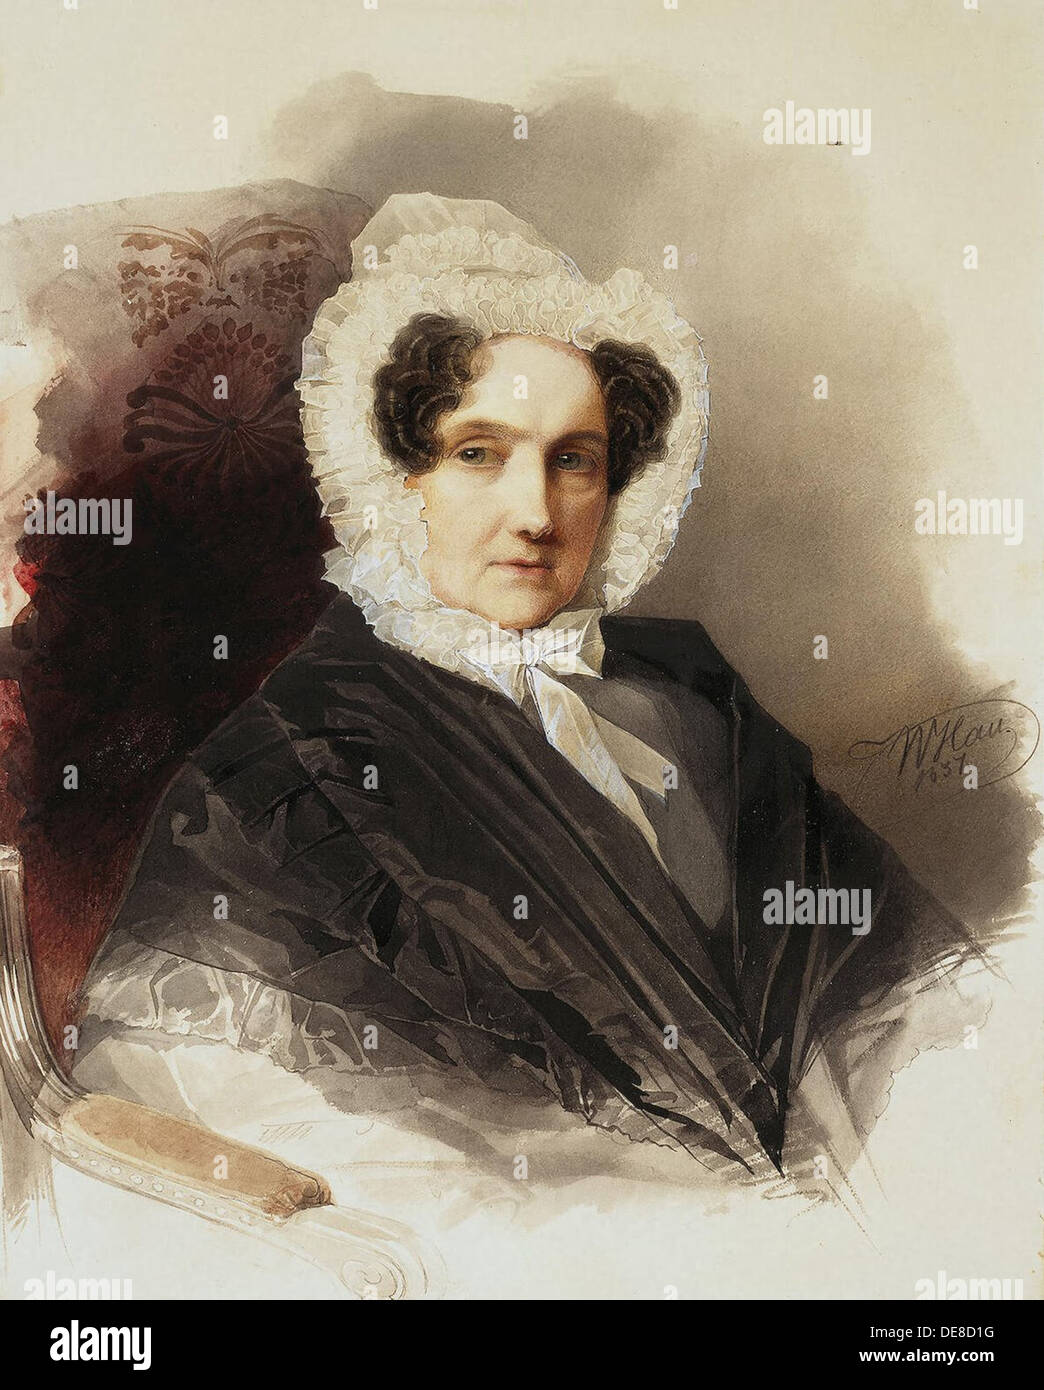 Portrait of Countess Anna Vladimirovna Bobrinskaya (1769-1846), 1837. Artist: Hau (Gau), Vladimir Ivanovich (1816-1895) Stock Photo